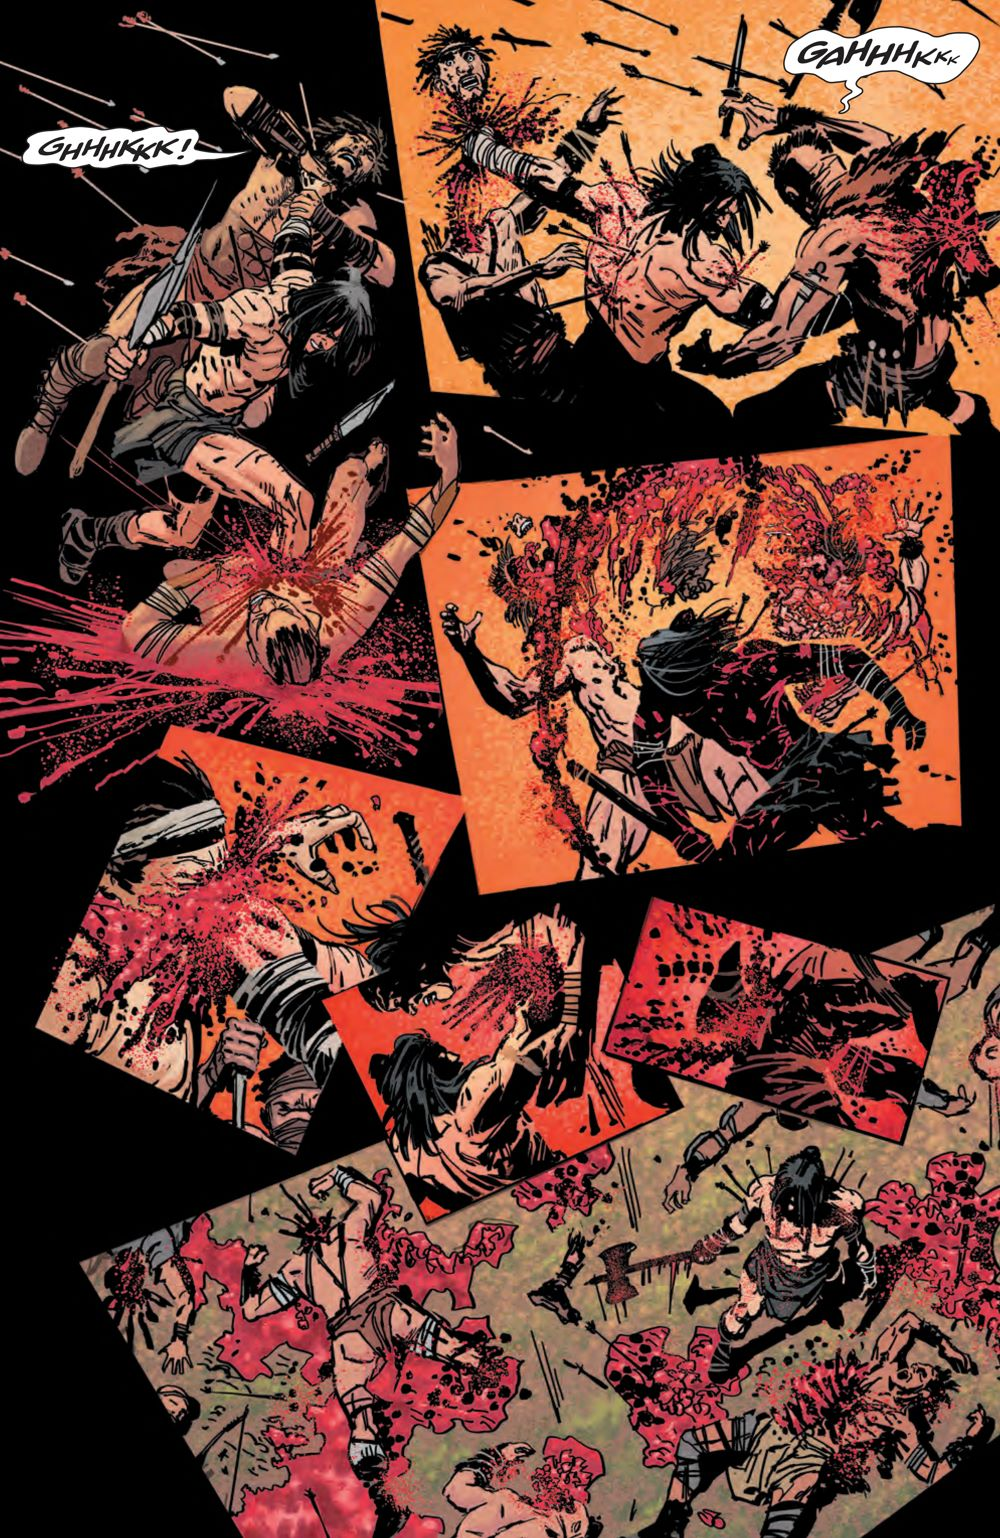 BRZRKR_003_PRESS_4 ComicList Previews: BRZRKR #3 (OF 12)